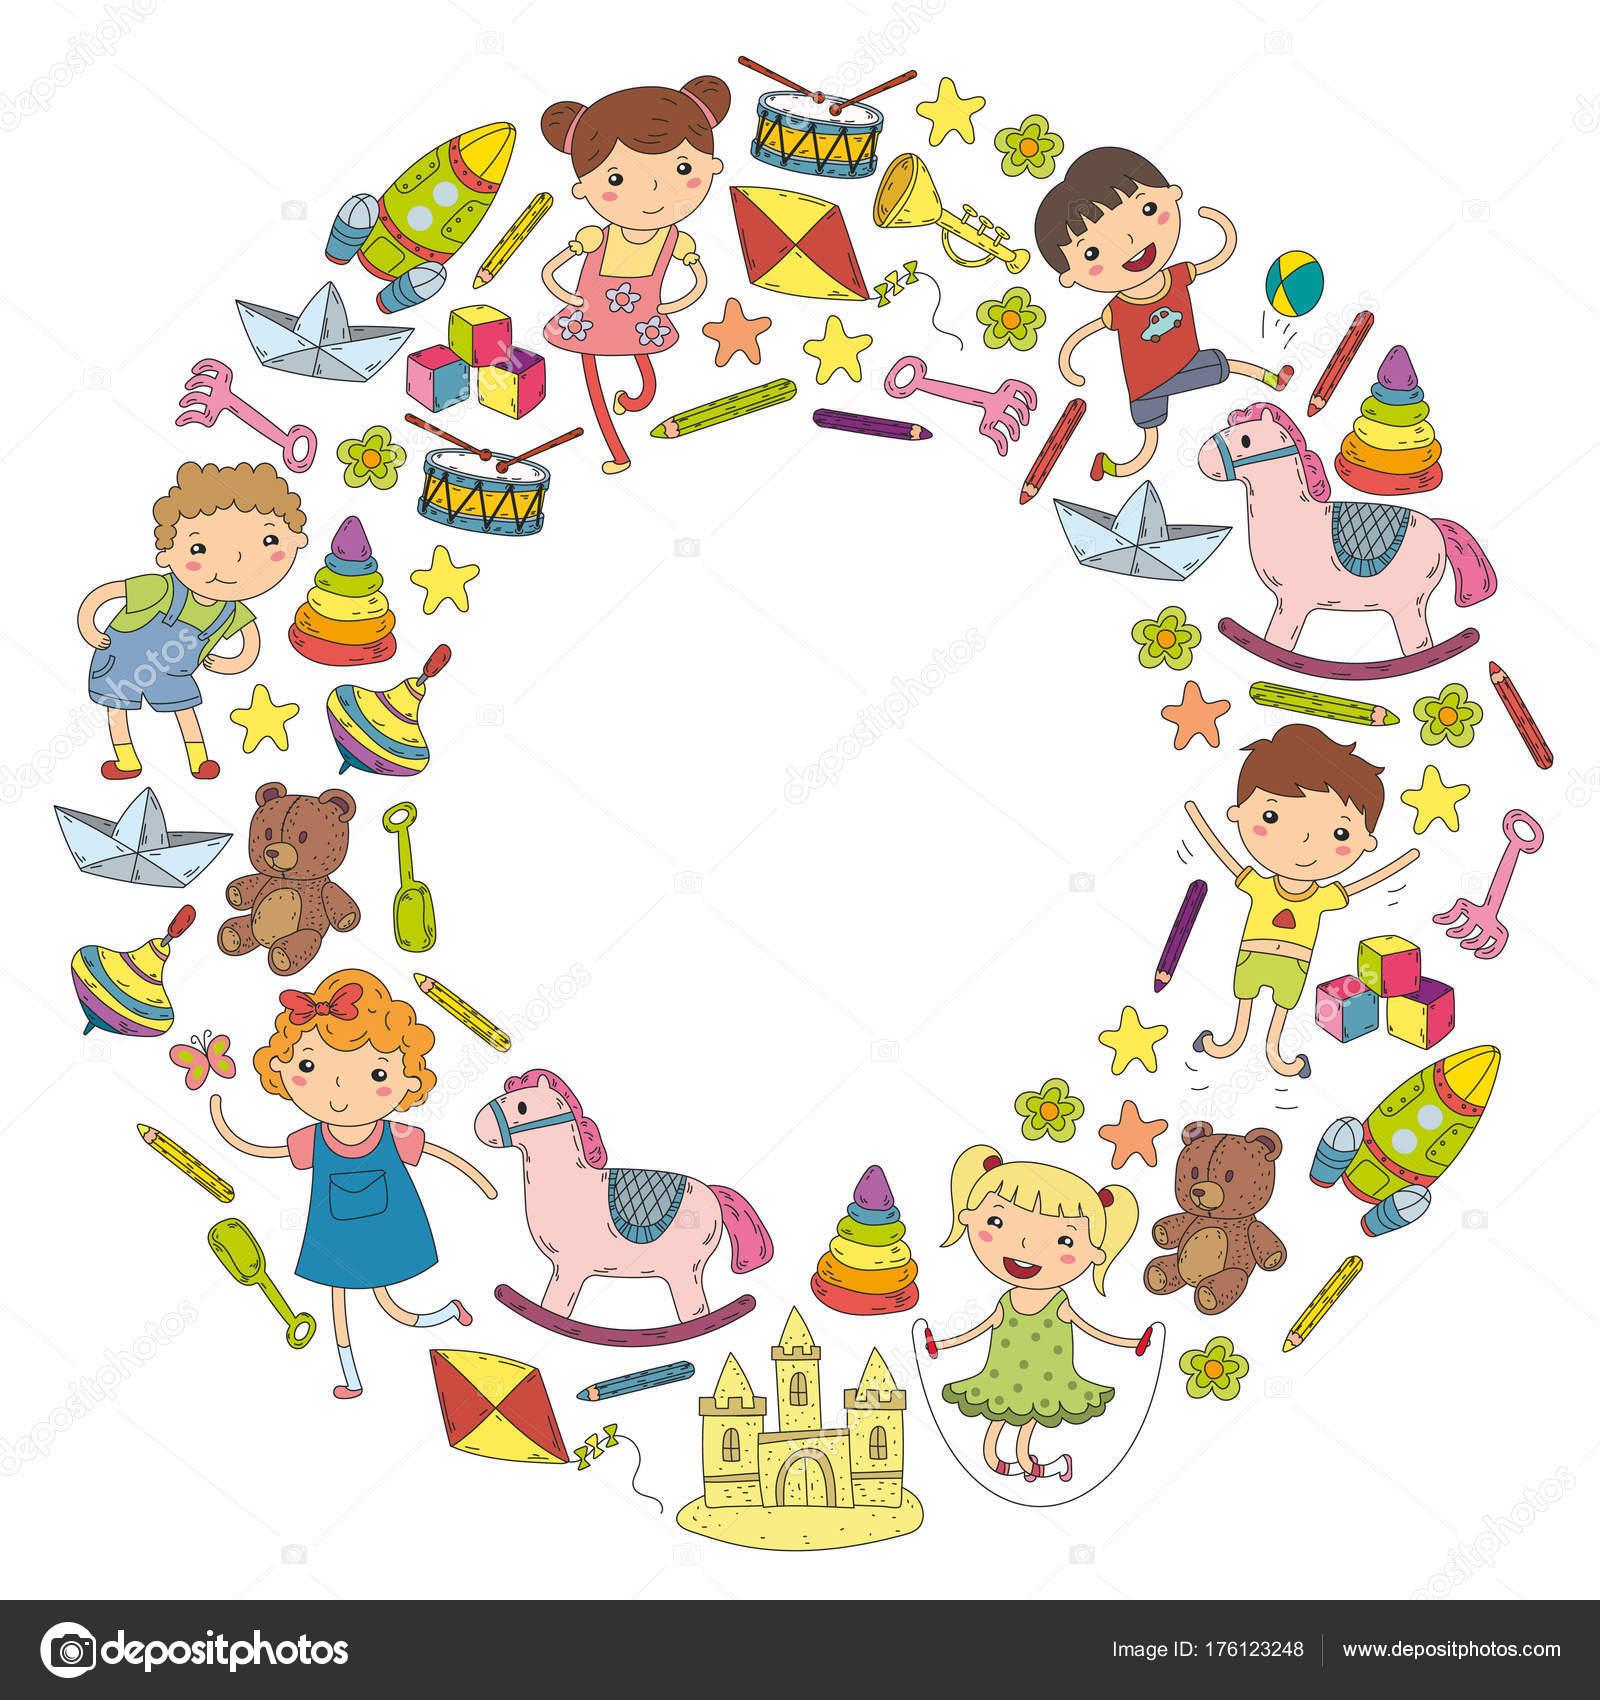 Art Girls Virtual Preschool: Kindergarten Nursery Preschool School Education With